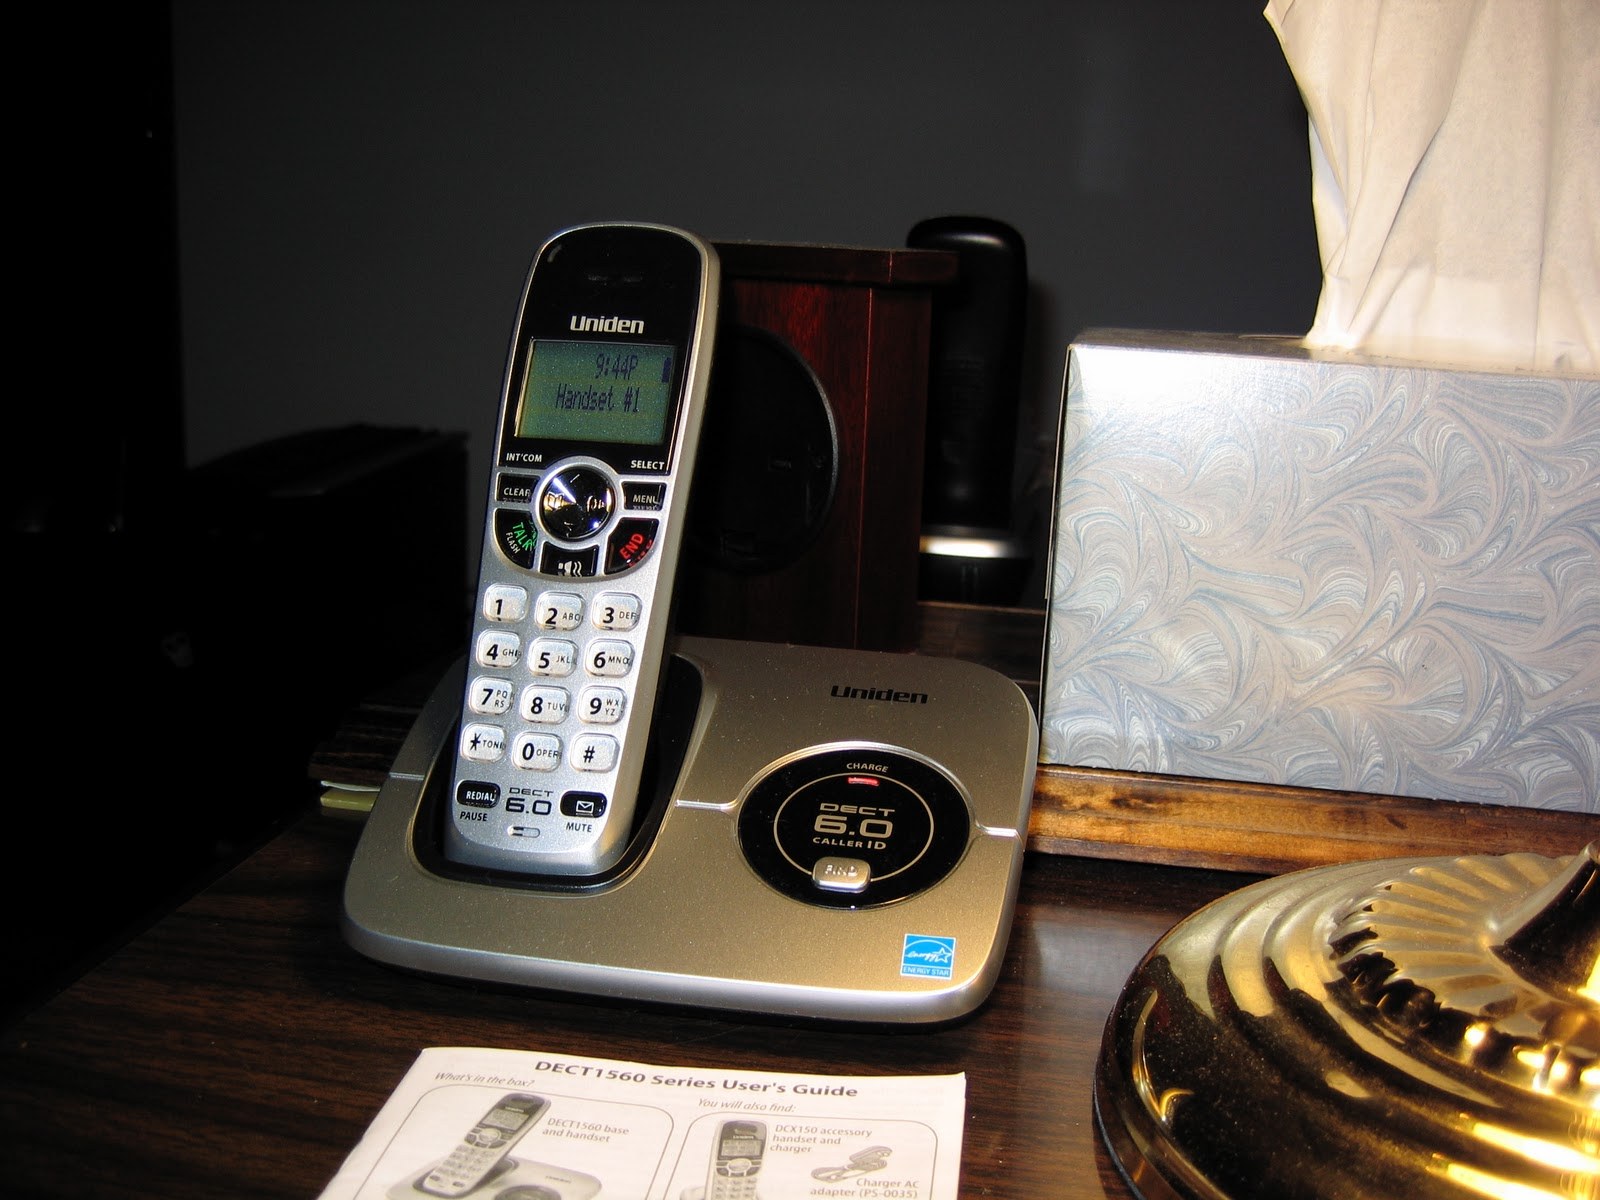 money saving tech tips philosophic musings uniden dect1560 rh money saving tech tips blogspot com Uniden Owner's Manual Uniden Owner's Manual